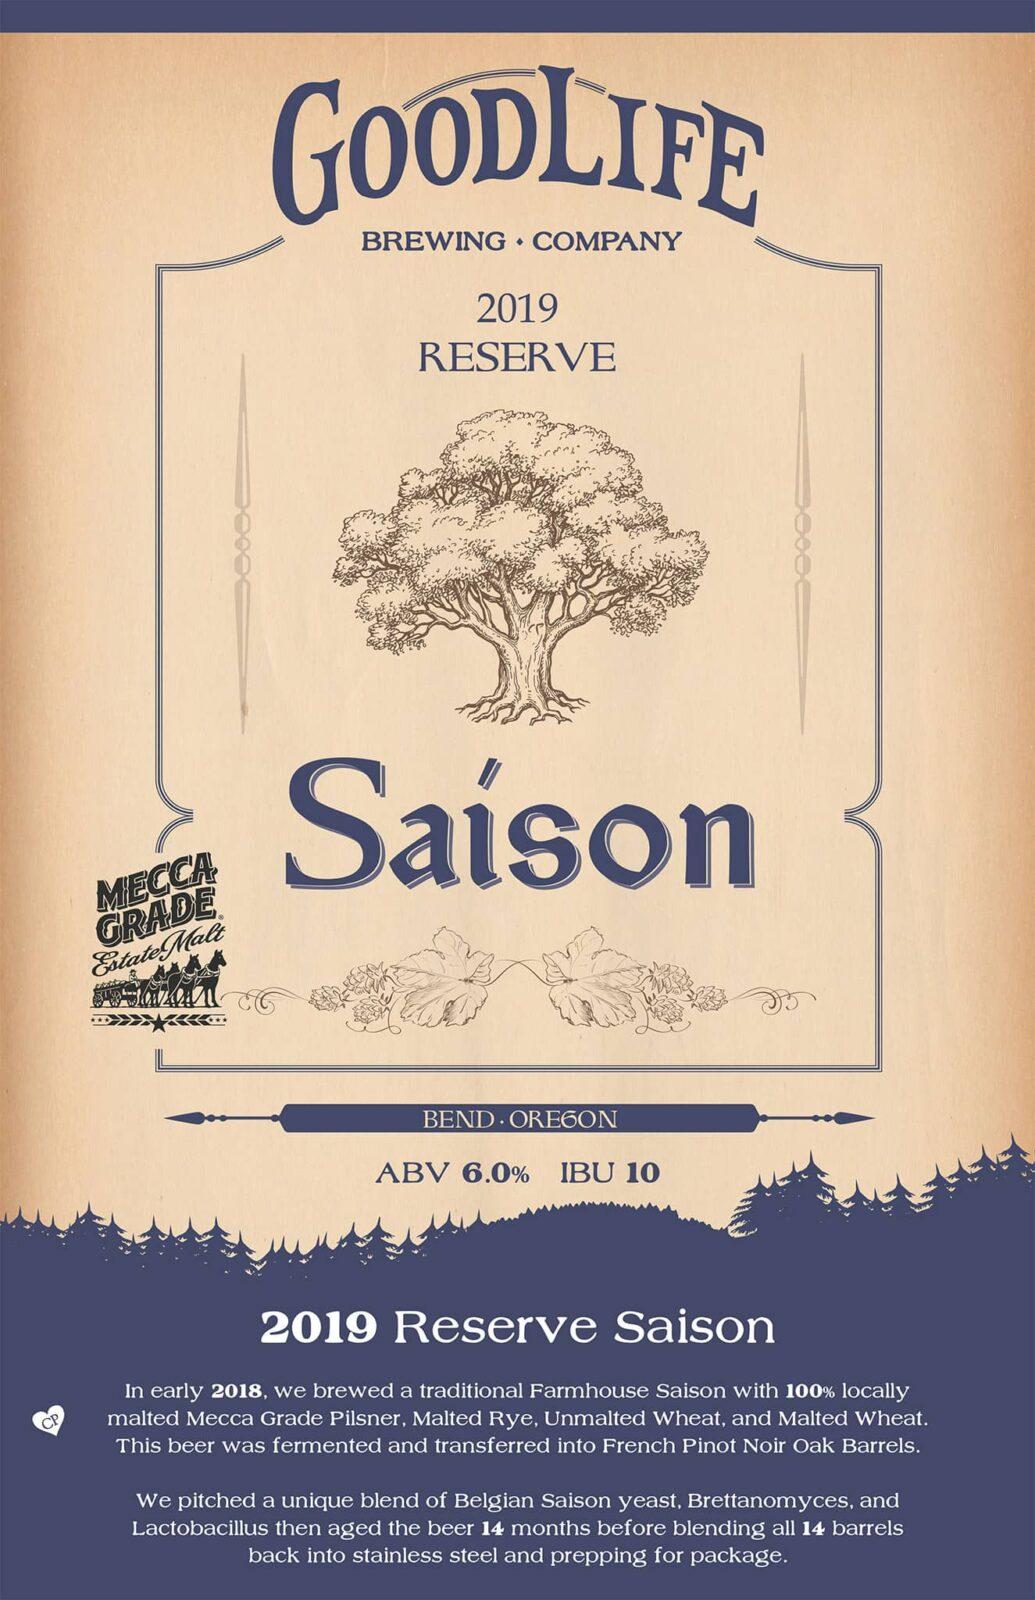 Goodlife 2019 Reserve Saison Poster